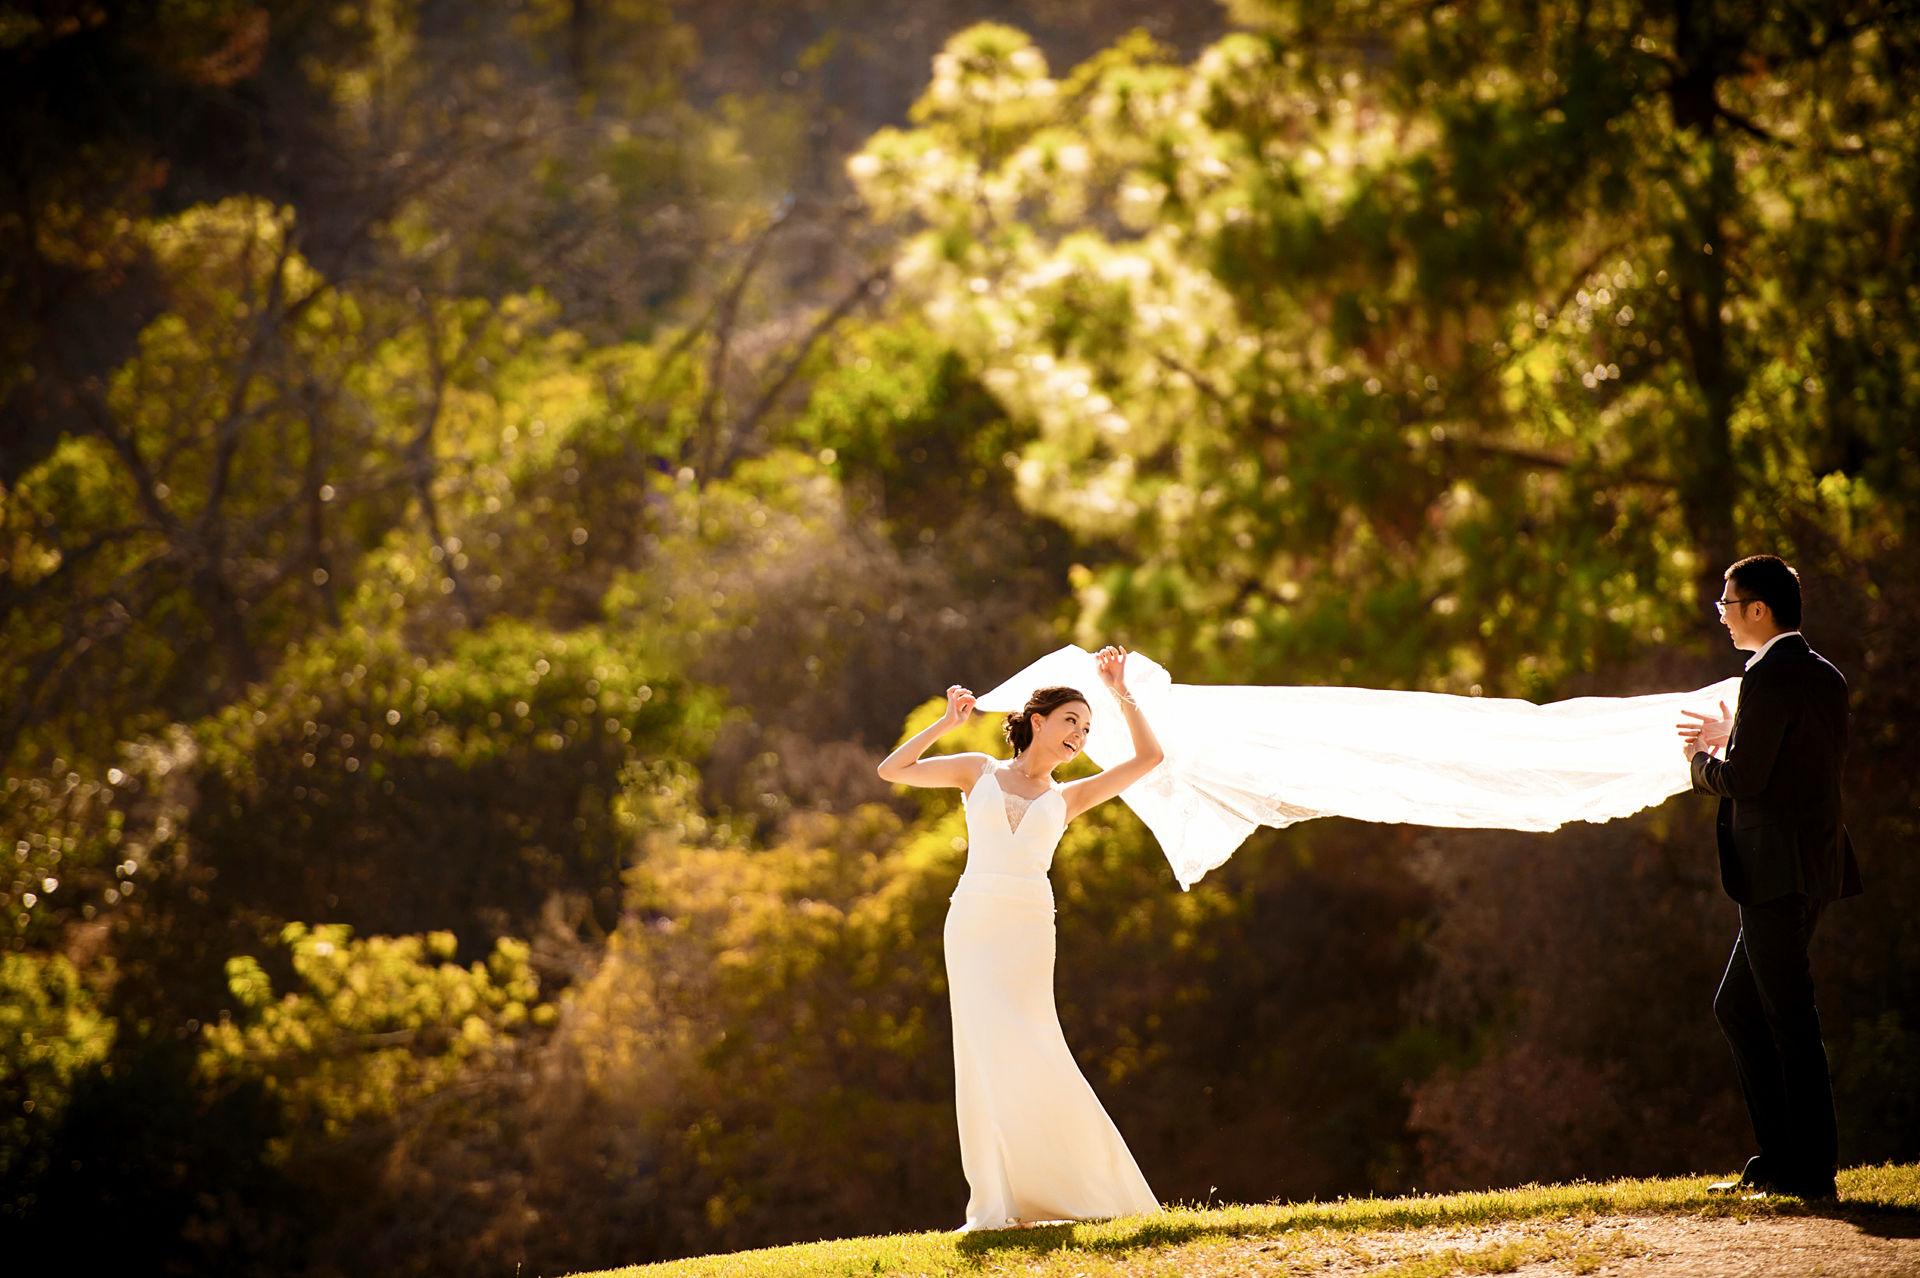 洛杉矶婚纱照by Tommy Xing